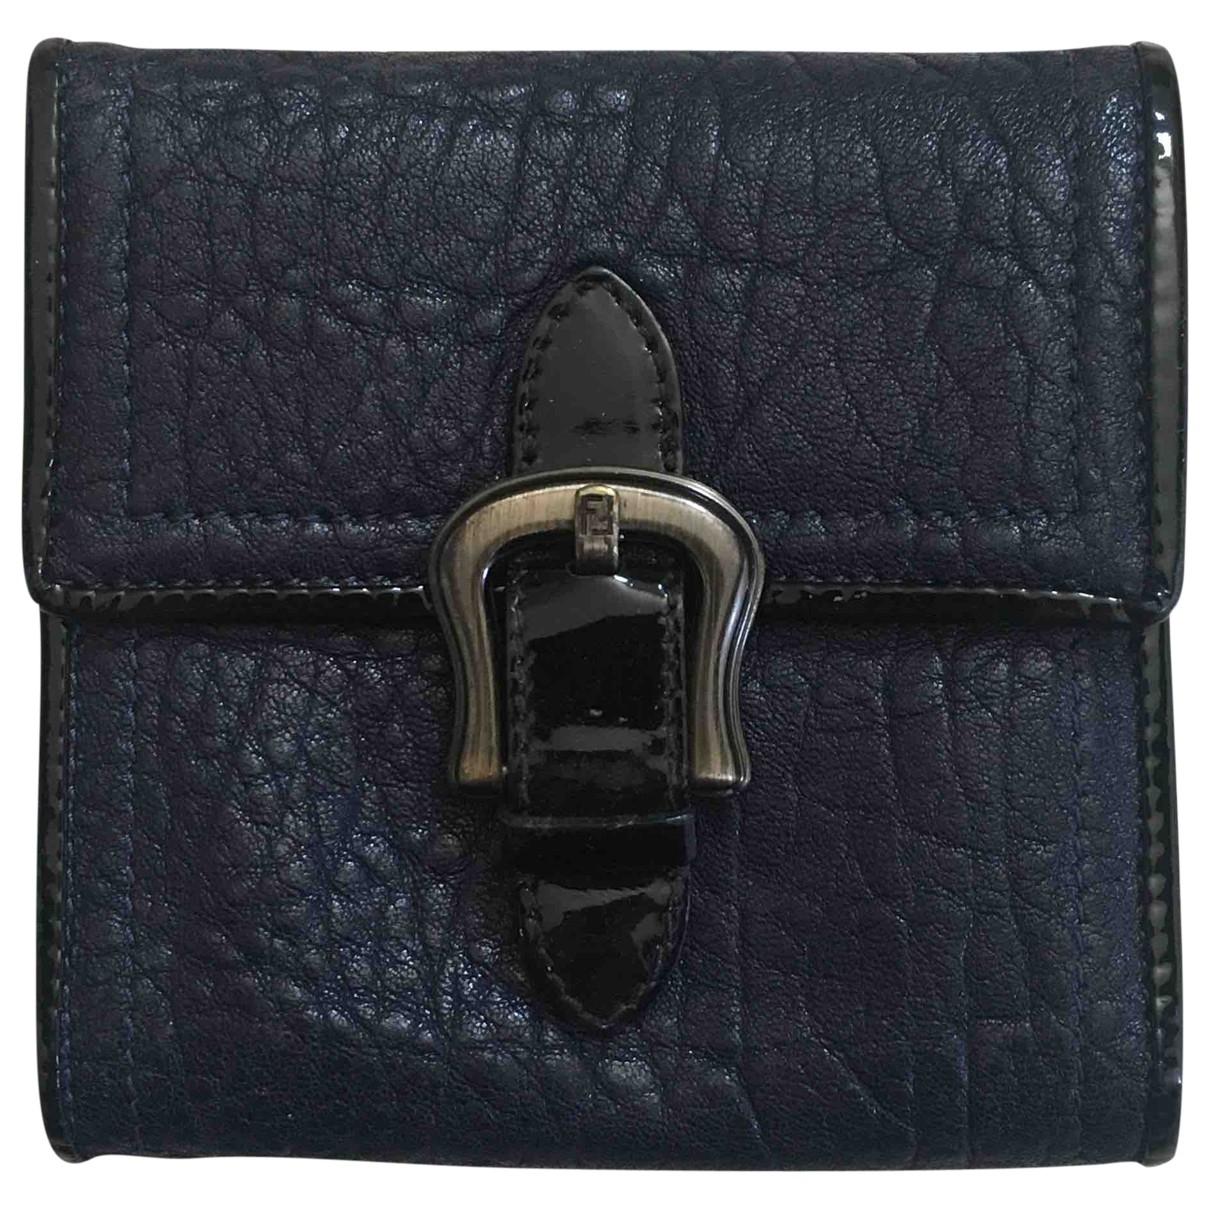 Fendi \N Black Leather wallet for Women \N